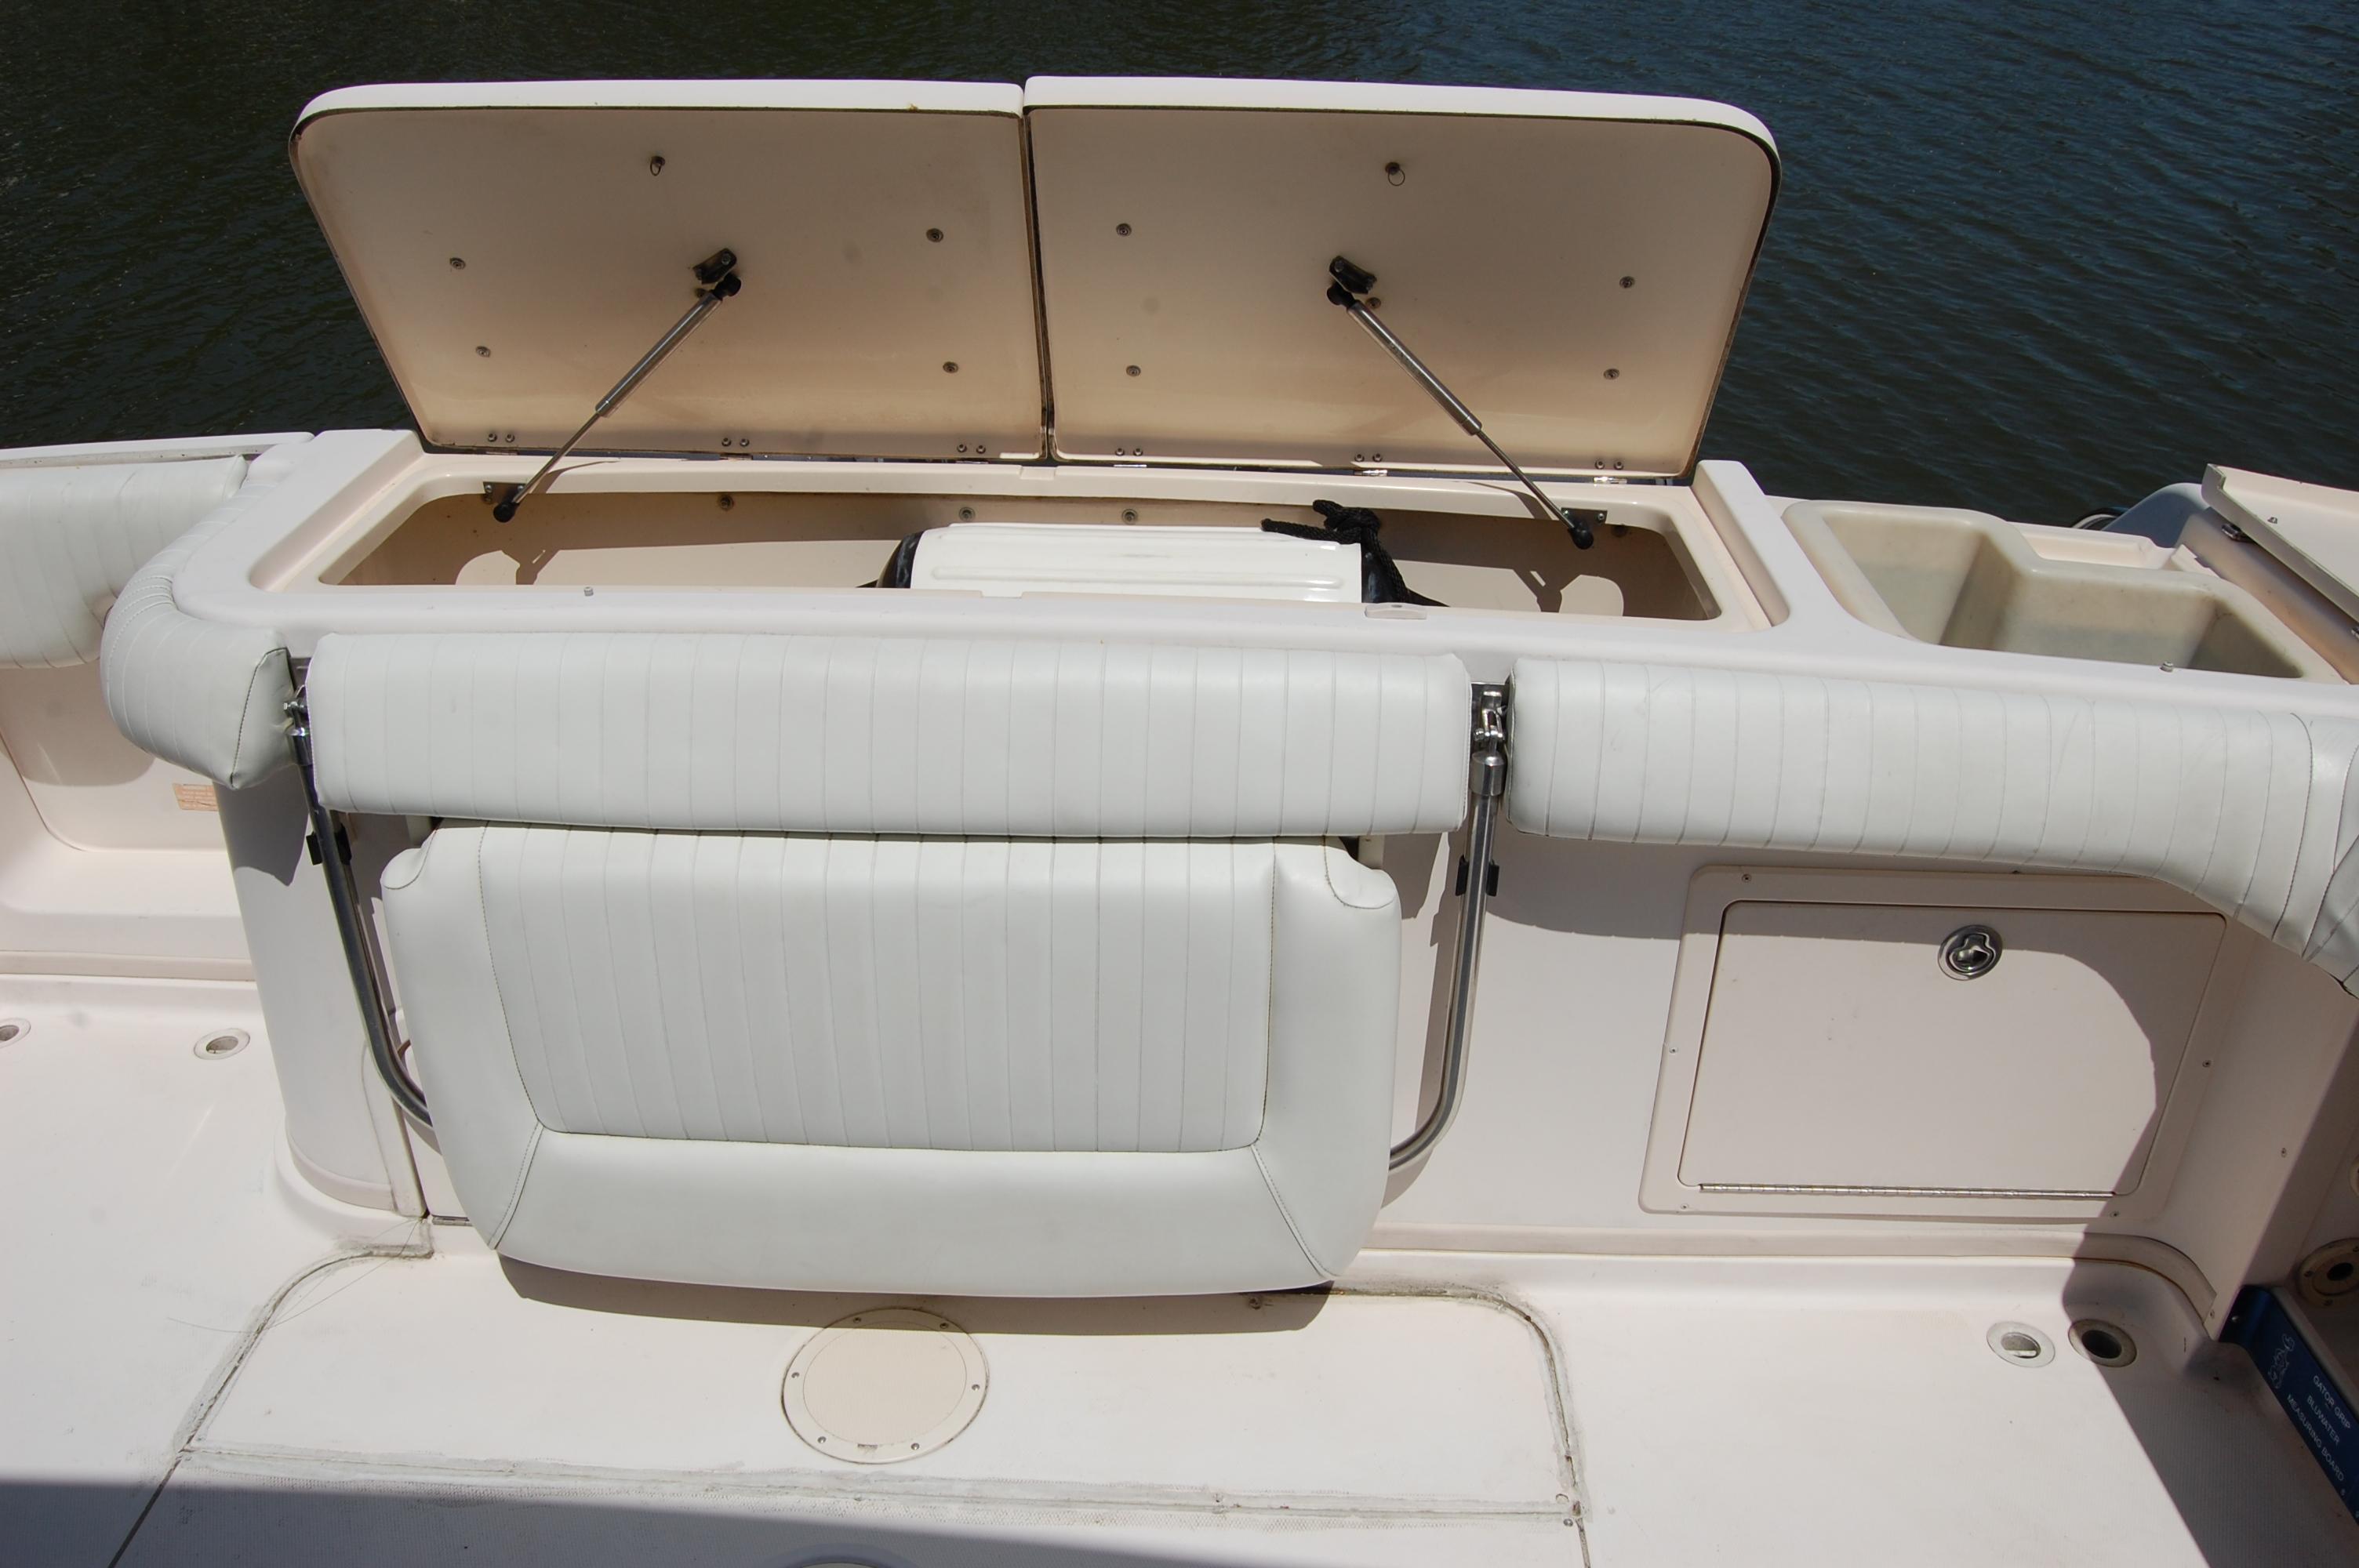 2002 Grady White 330 Express, XL transom fishbox